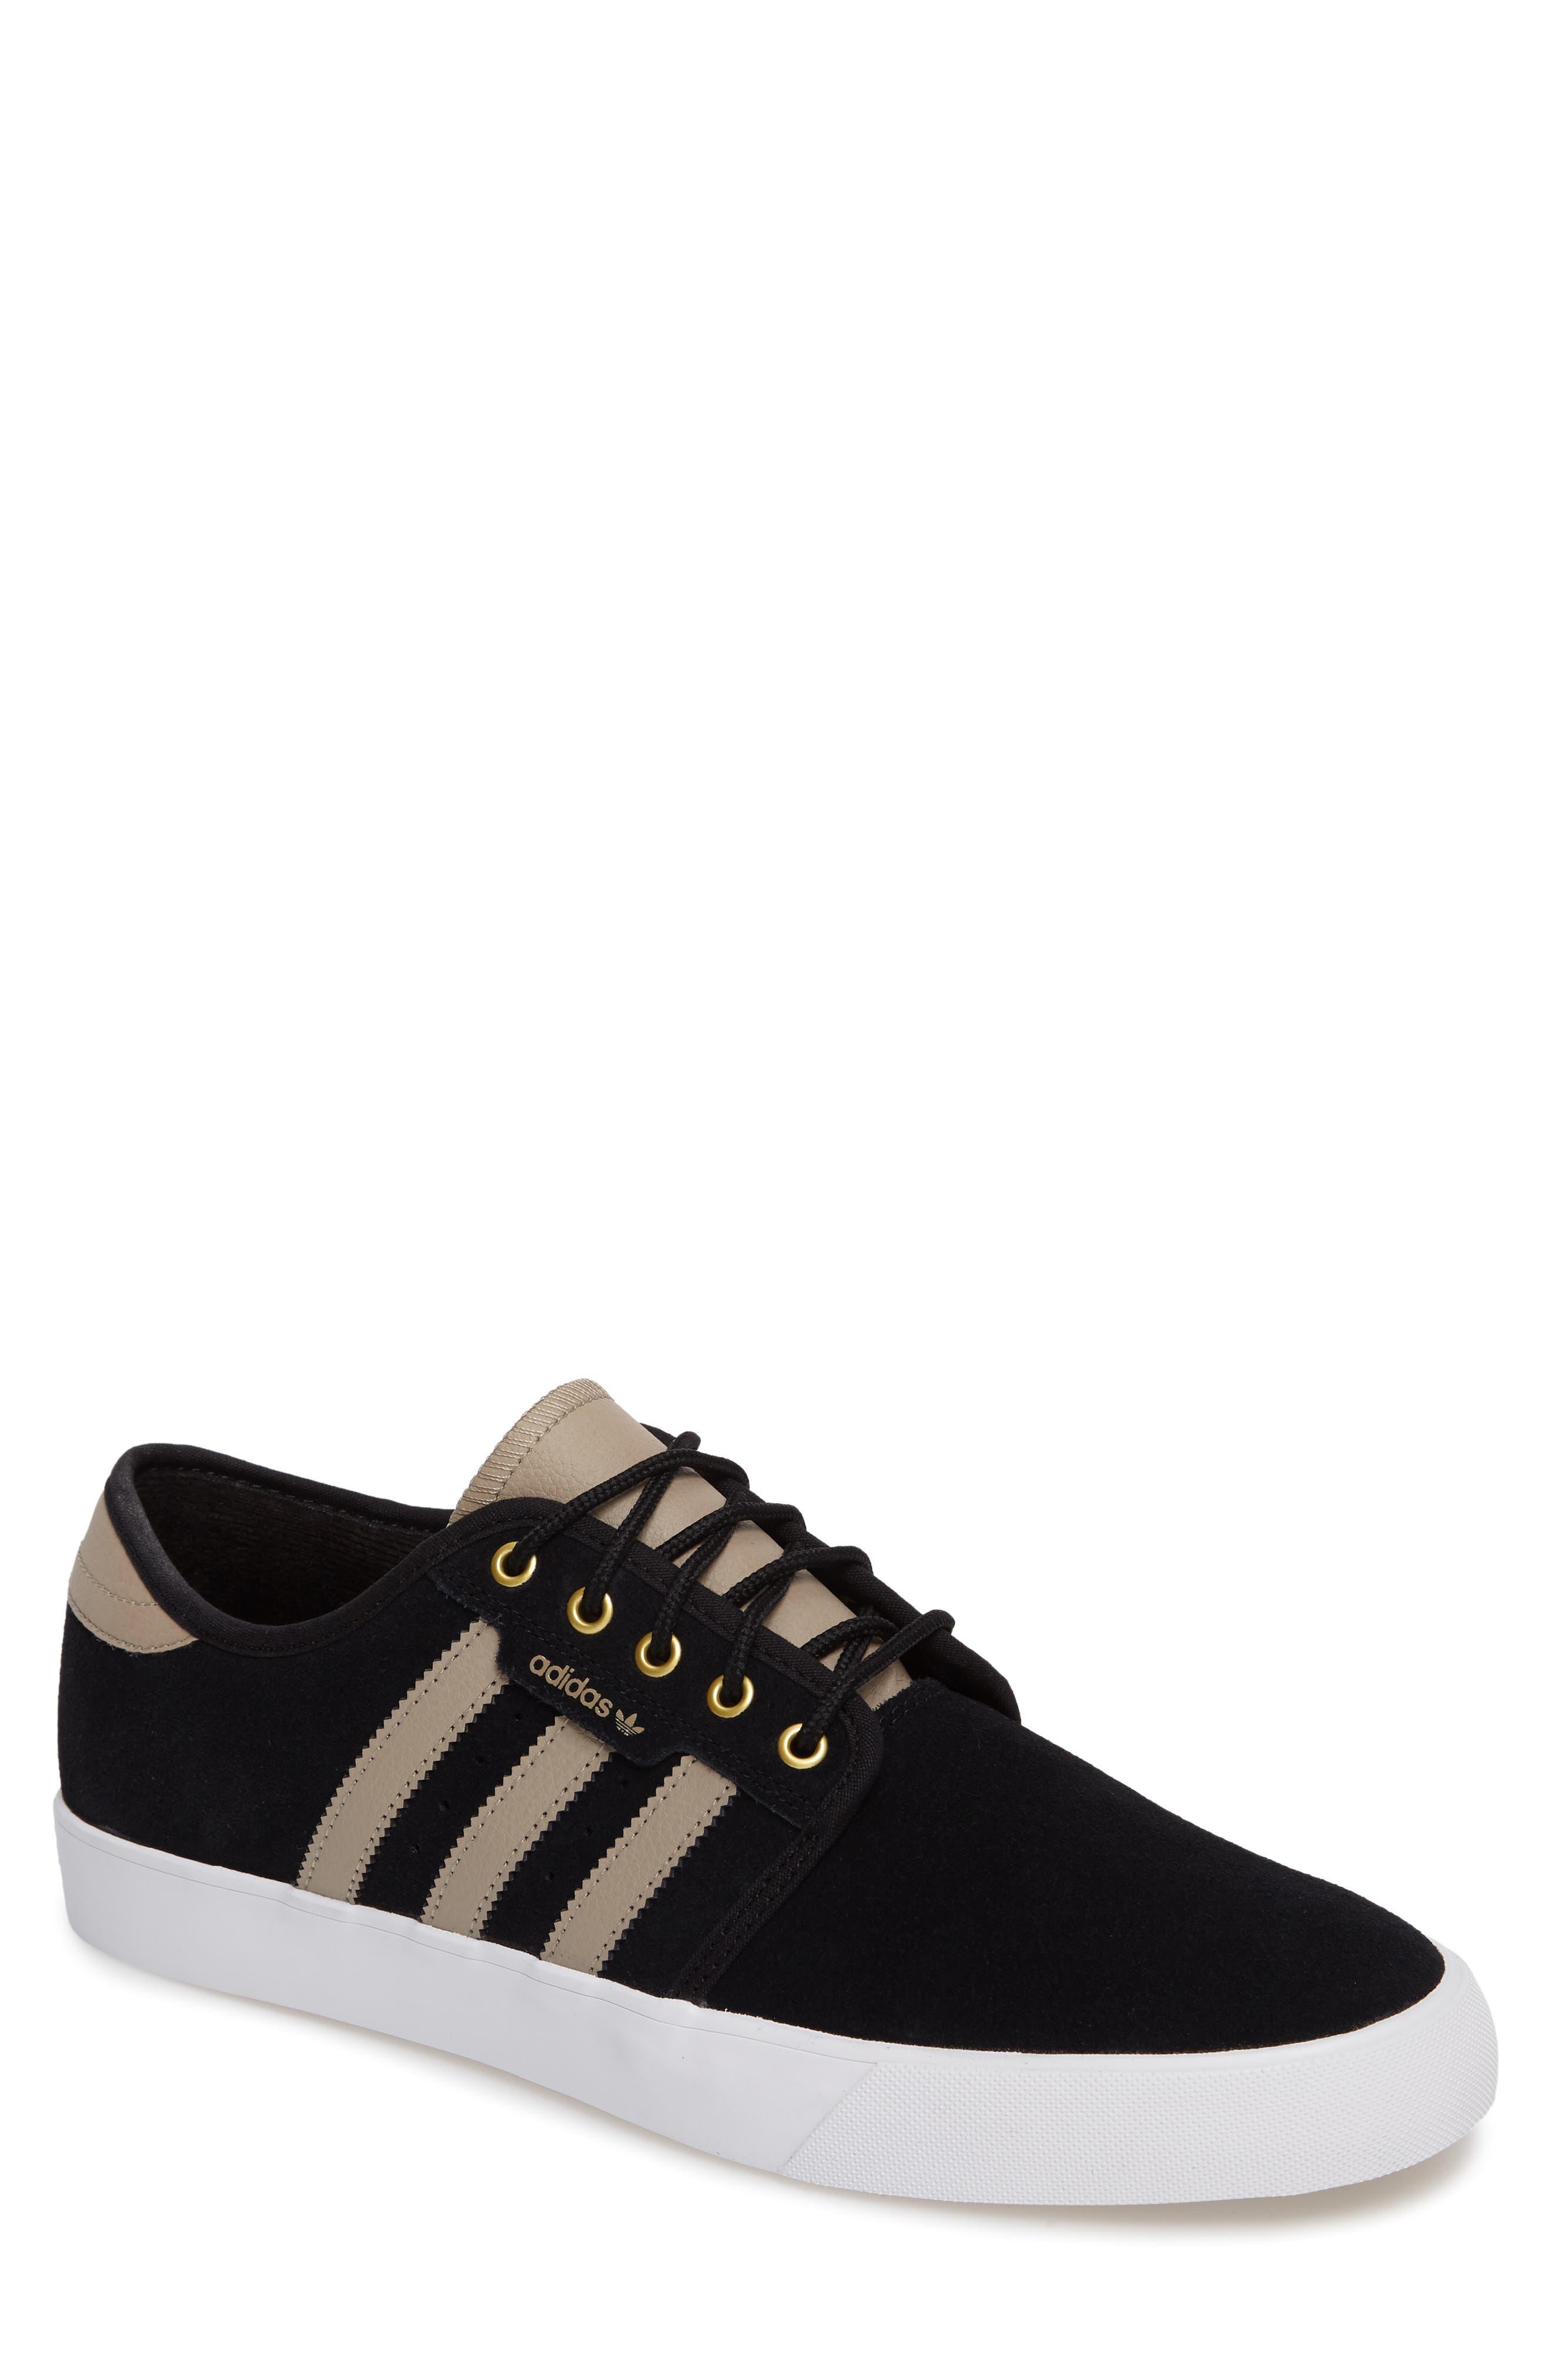 Alternate Image 1 Selected - adidas 'Seeley' Skate Sneaker (Men)